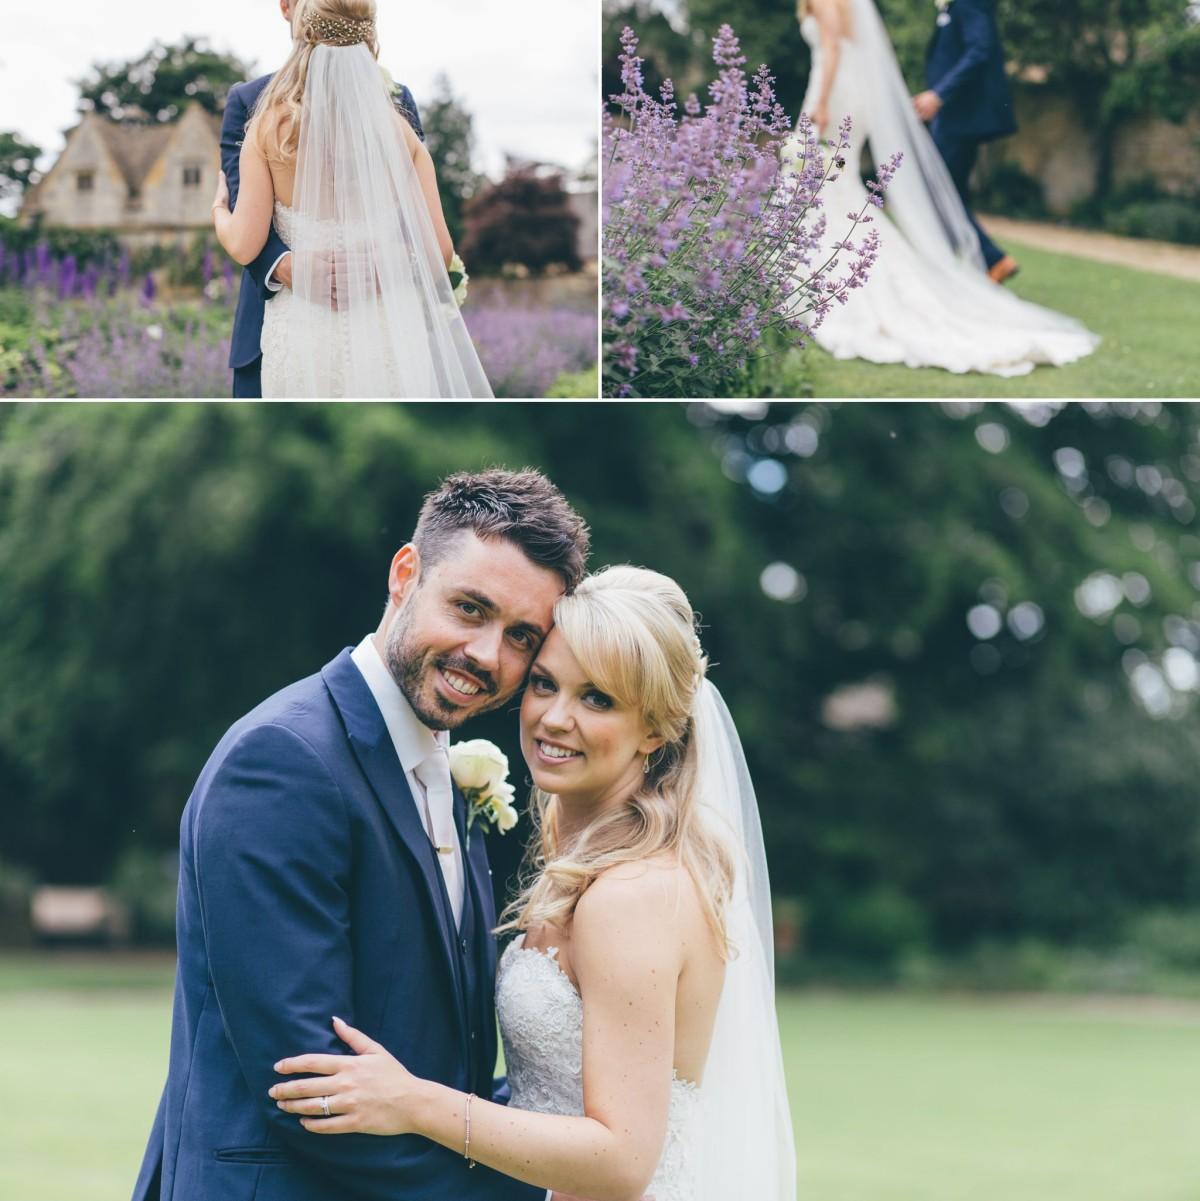 welsh_wedding_photographer_rachel_lambert_photography_lower_slaughter_manor_house_cotswolds_harriet_dean_ 39